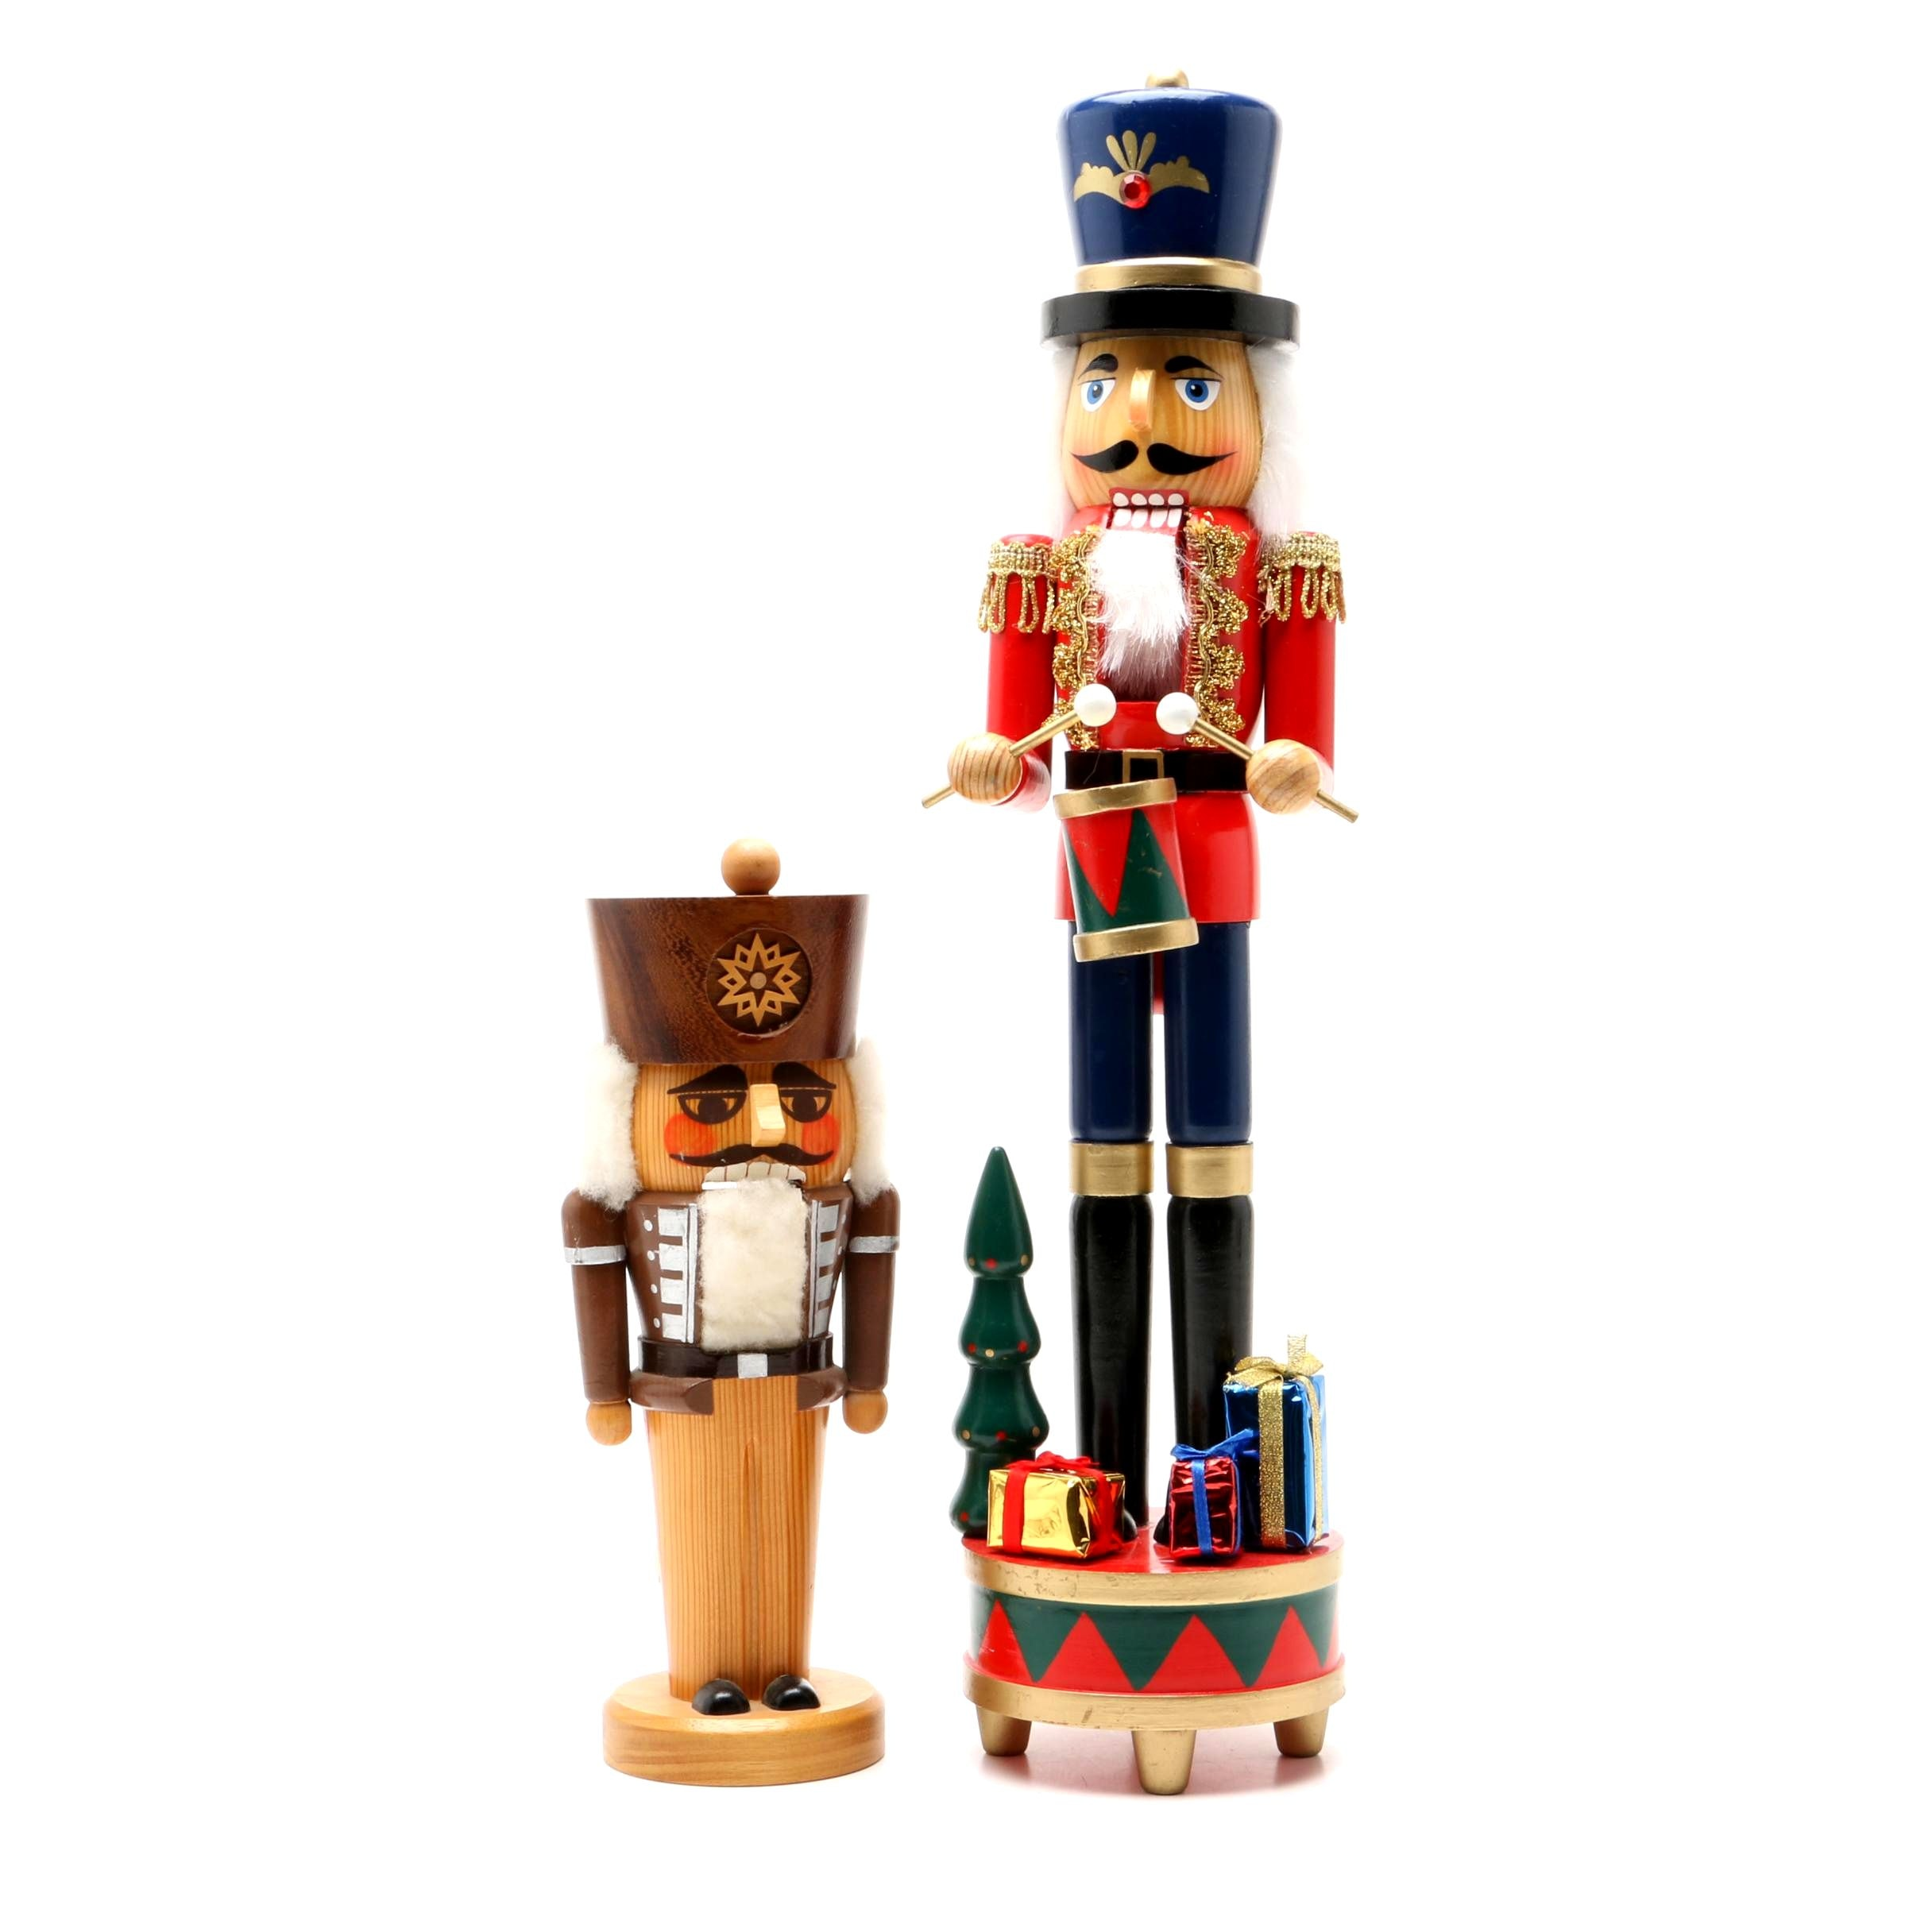 Two Wooden Nutcrackers